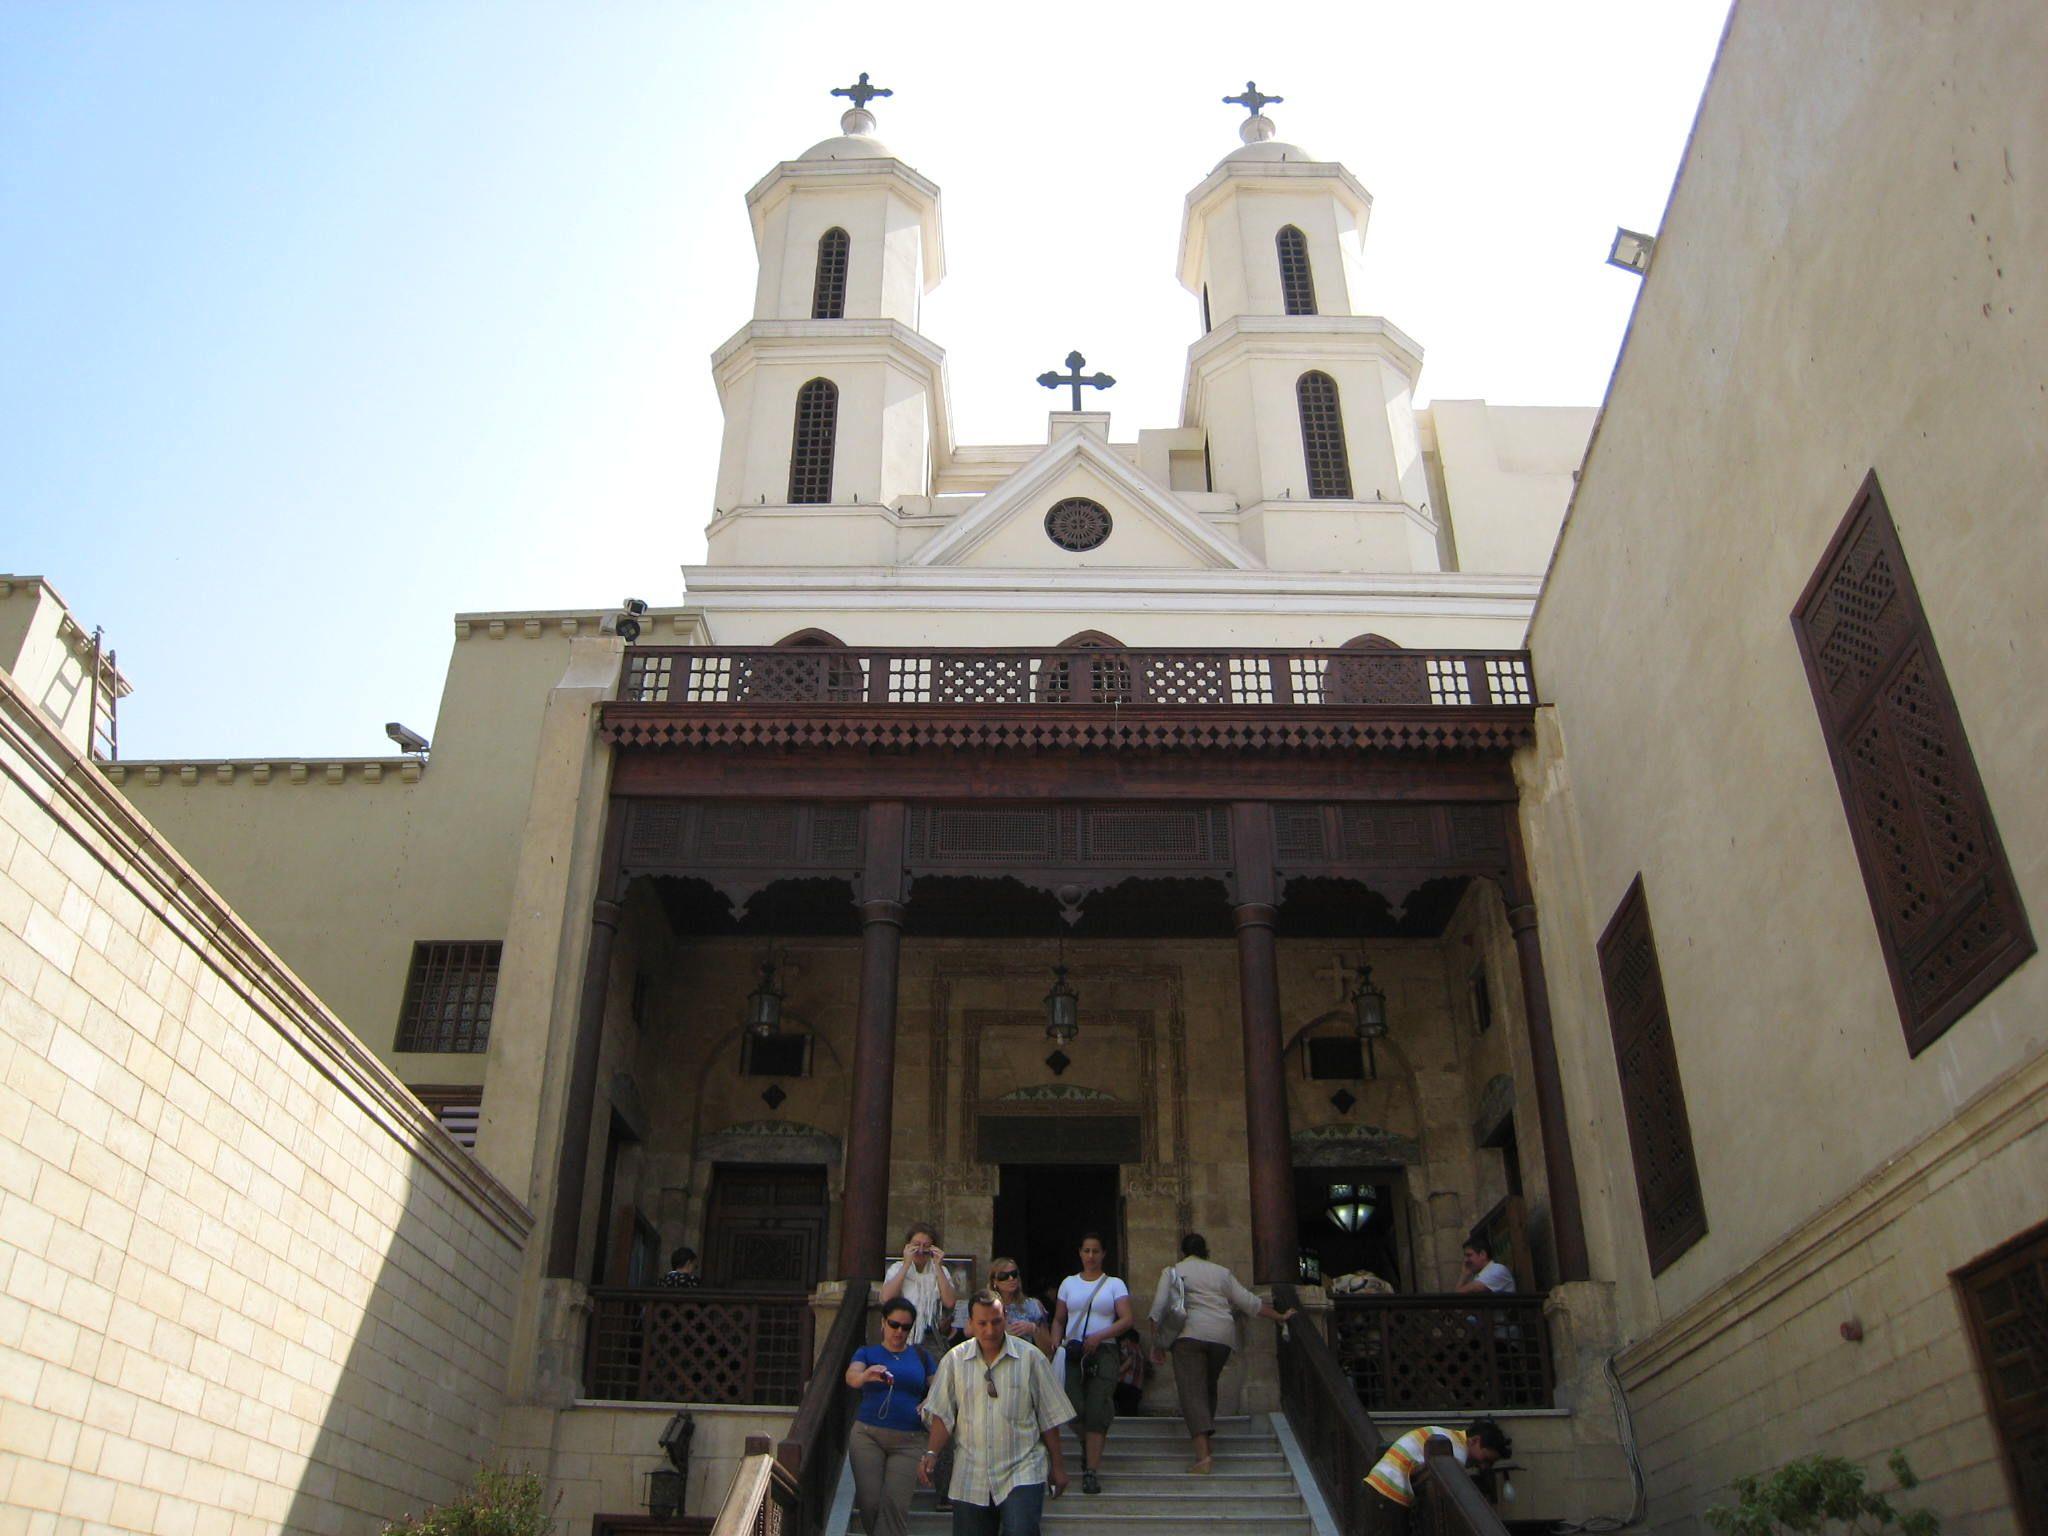 coptic-church-mary-virginity